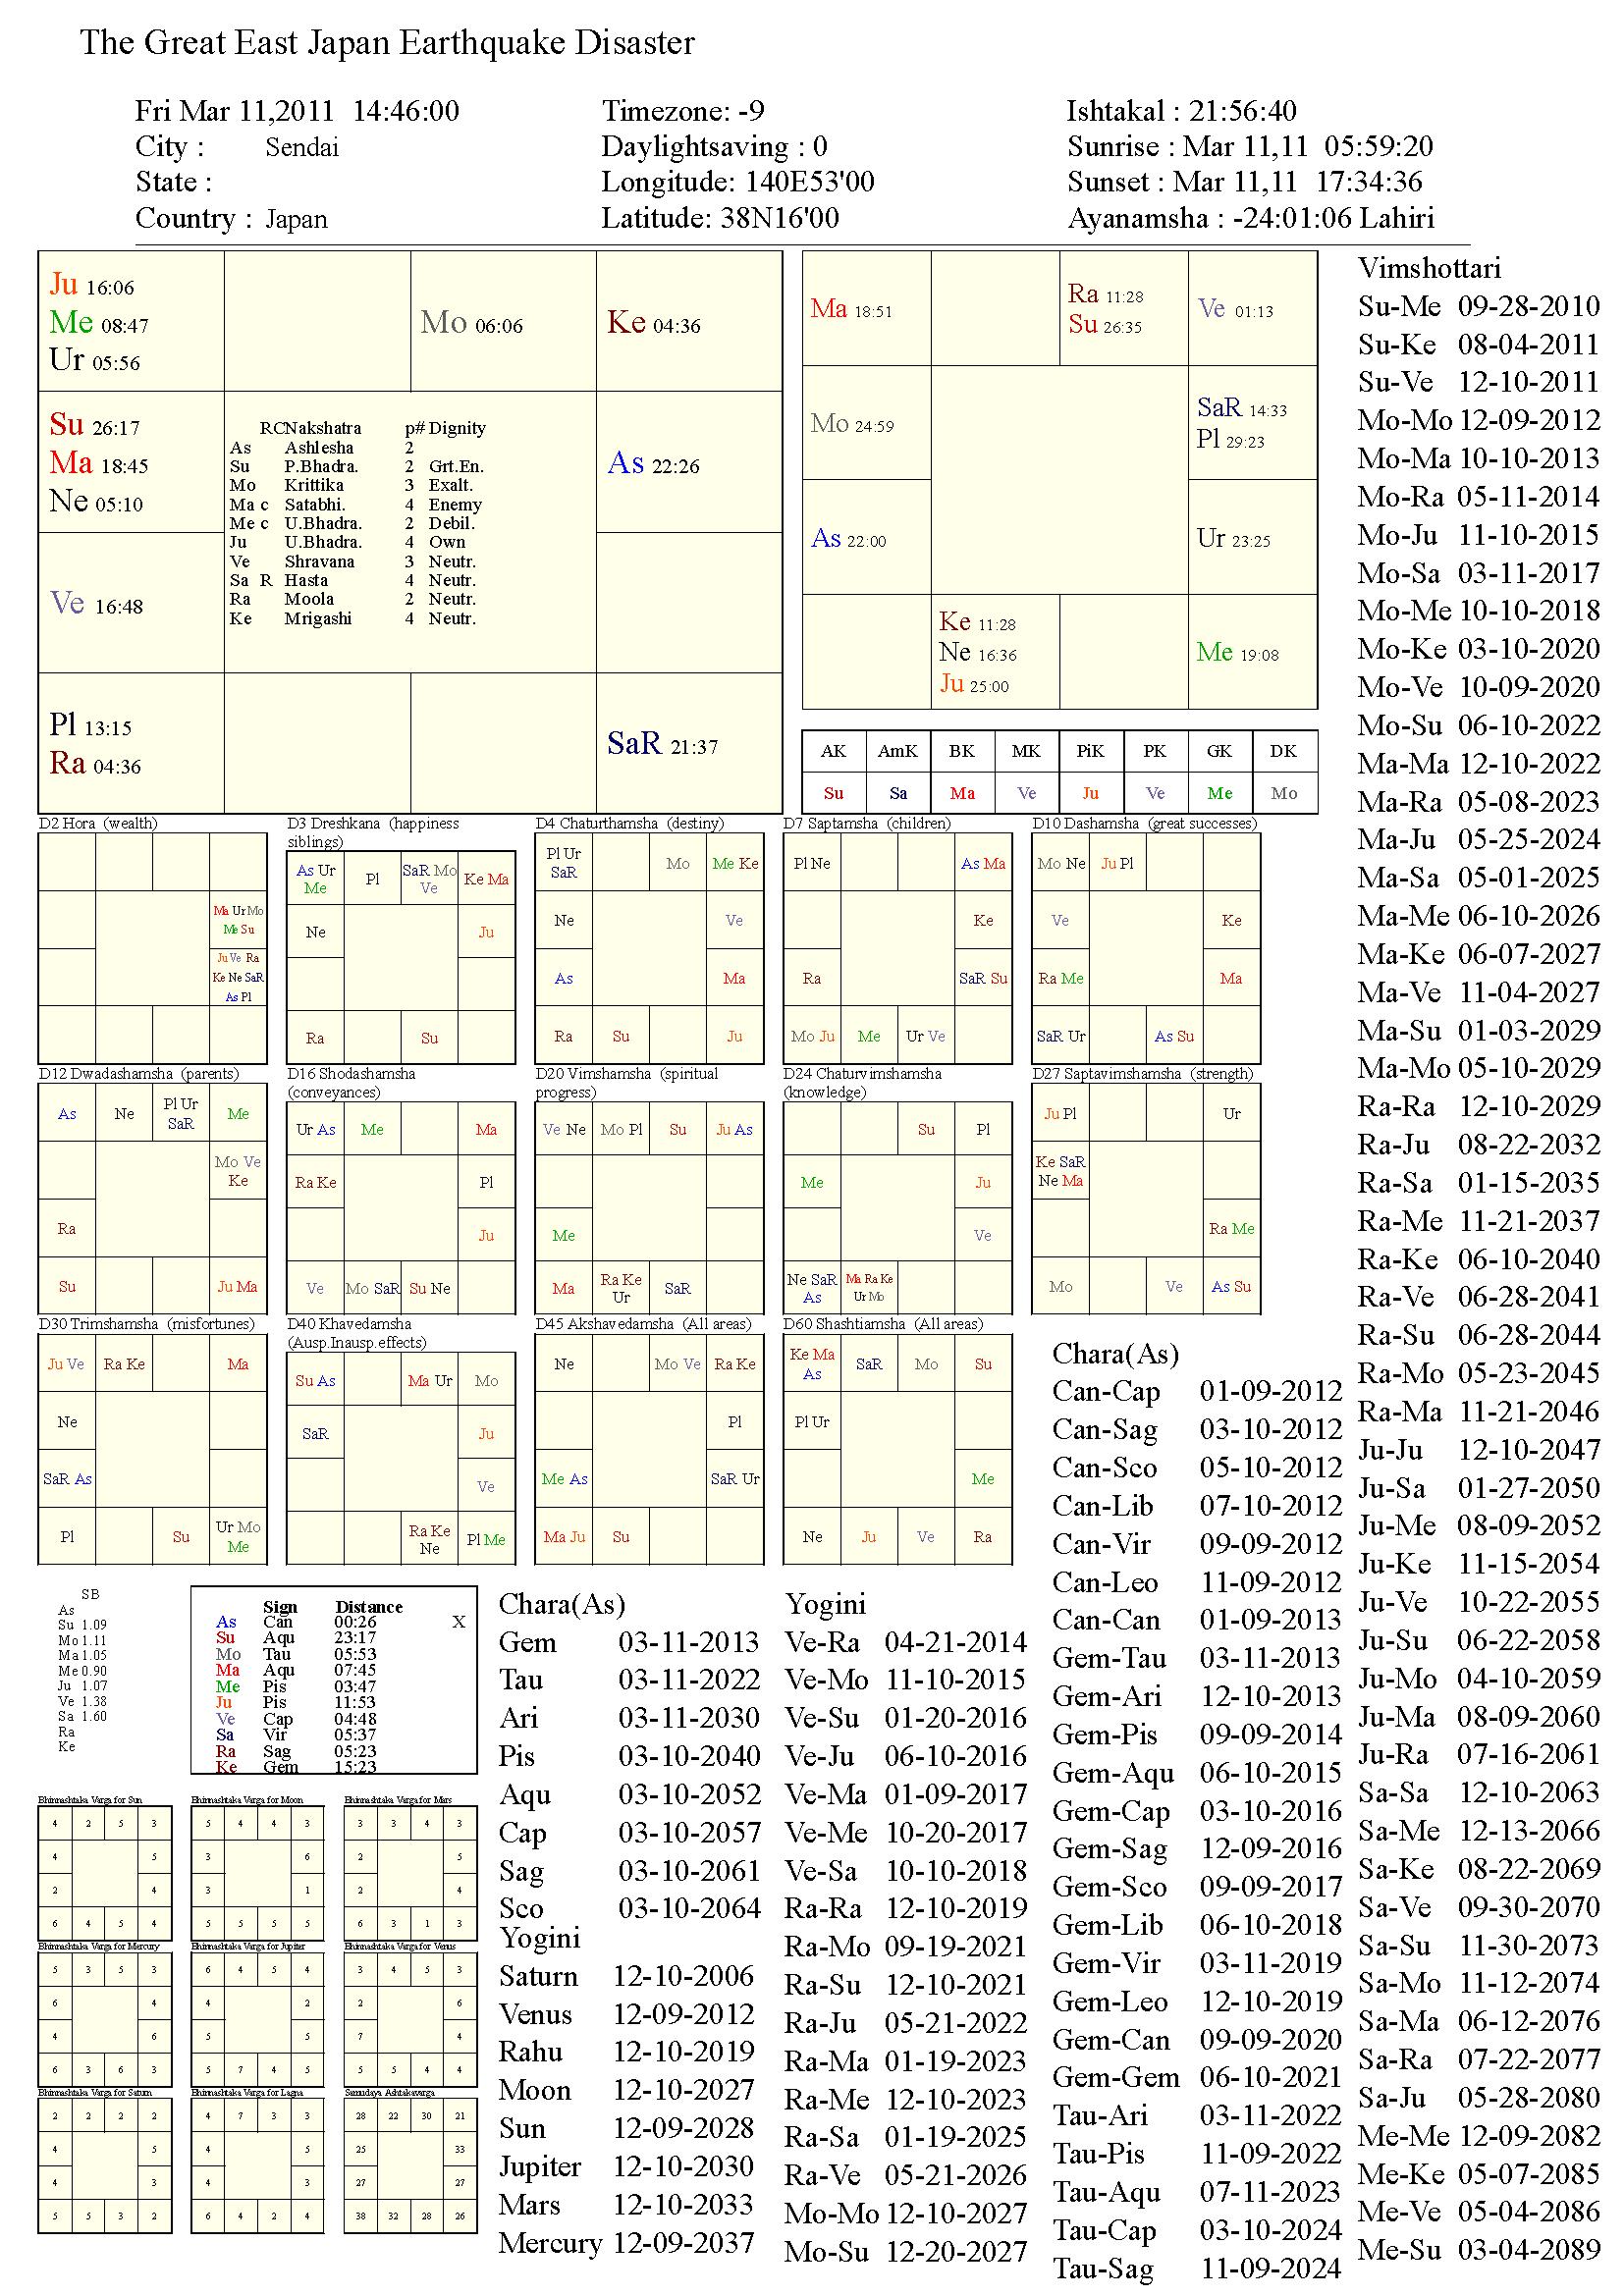 TheGreatEastJapanEarthquakeDisaster_chart